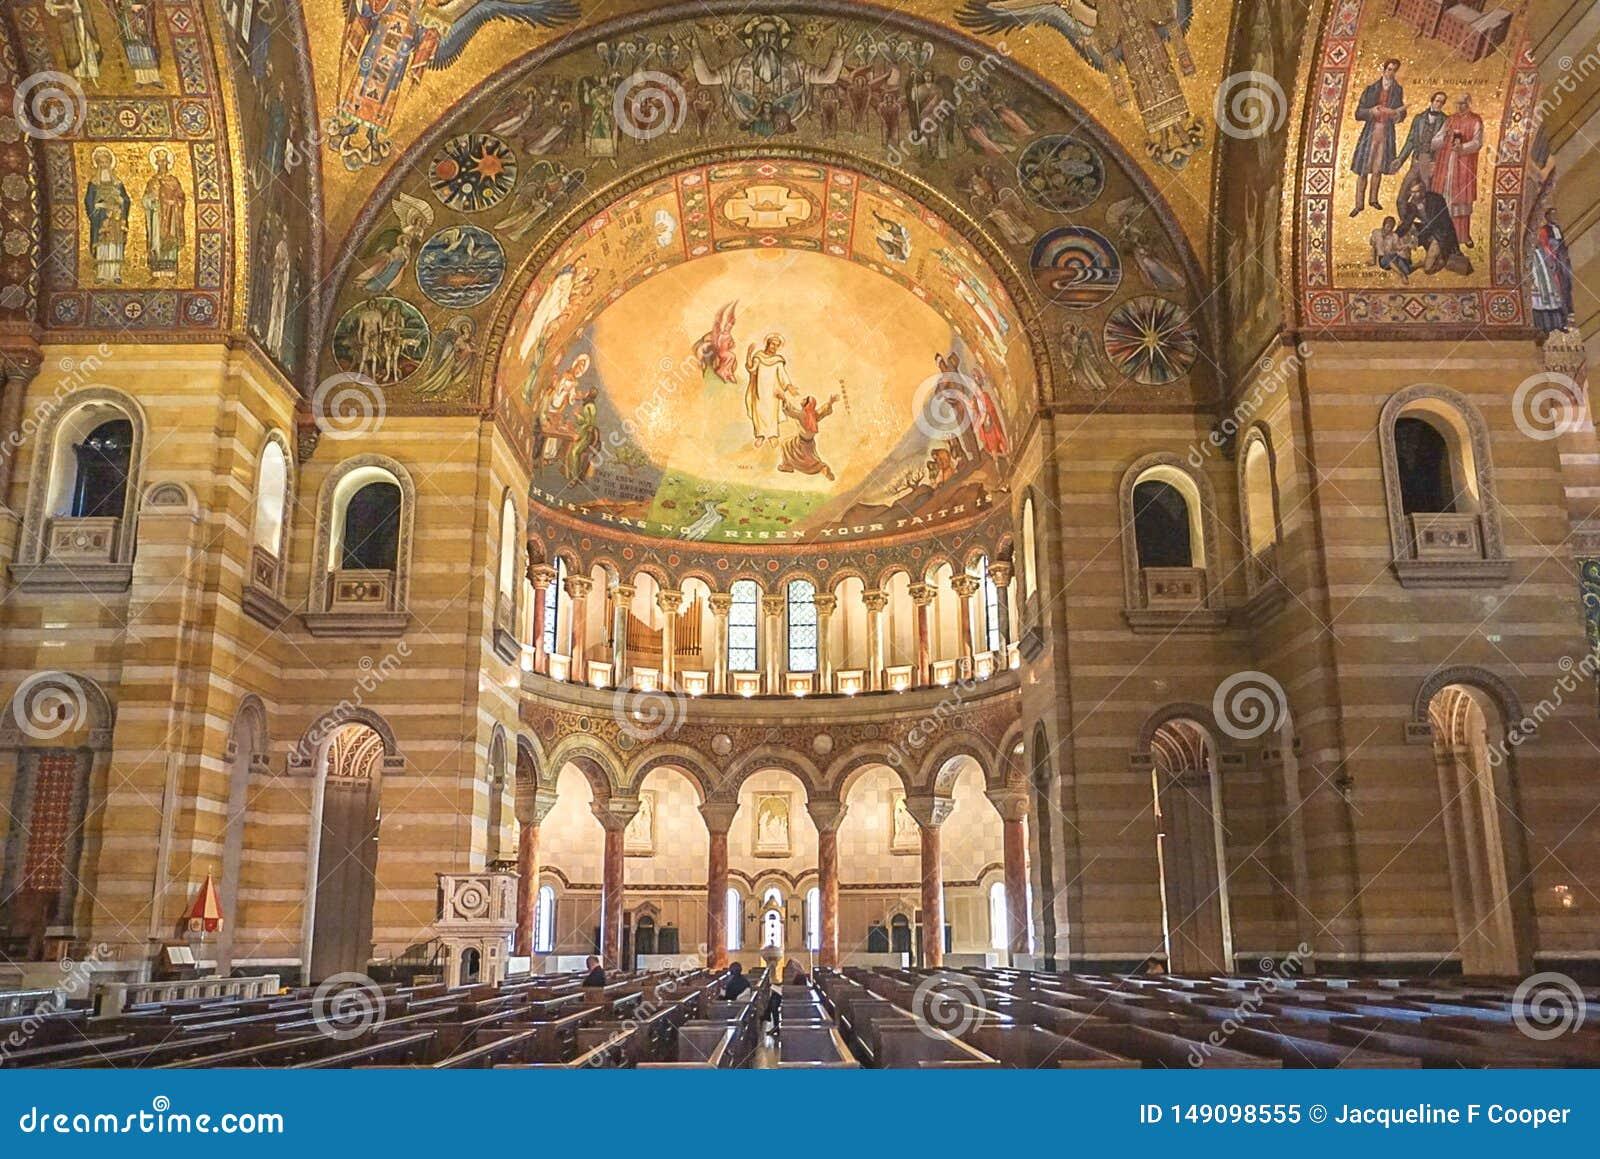 Сент-Луис Миссури: 7-ое ноября 2018; Базилика собора Сент-Луис